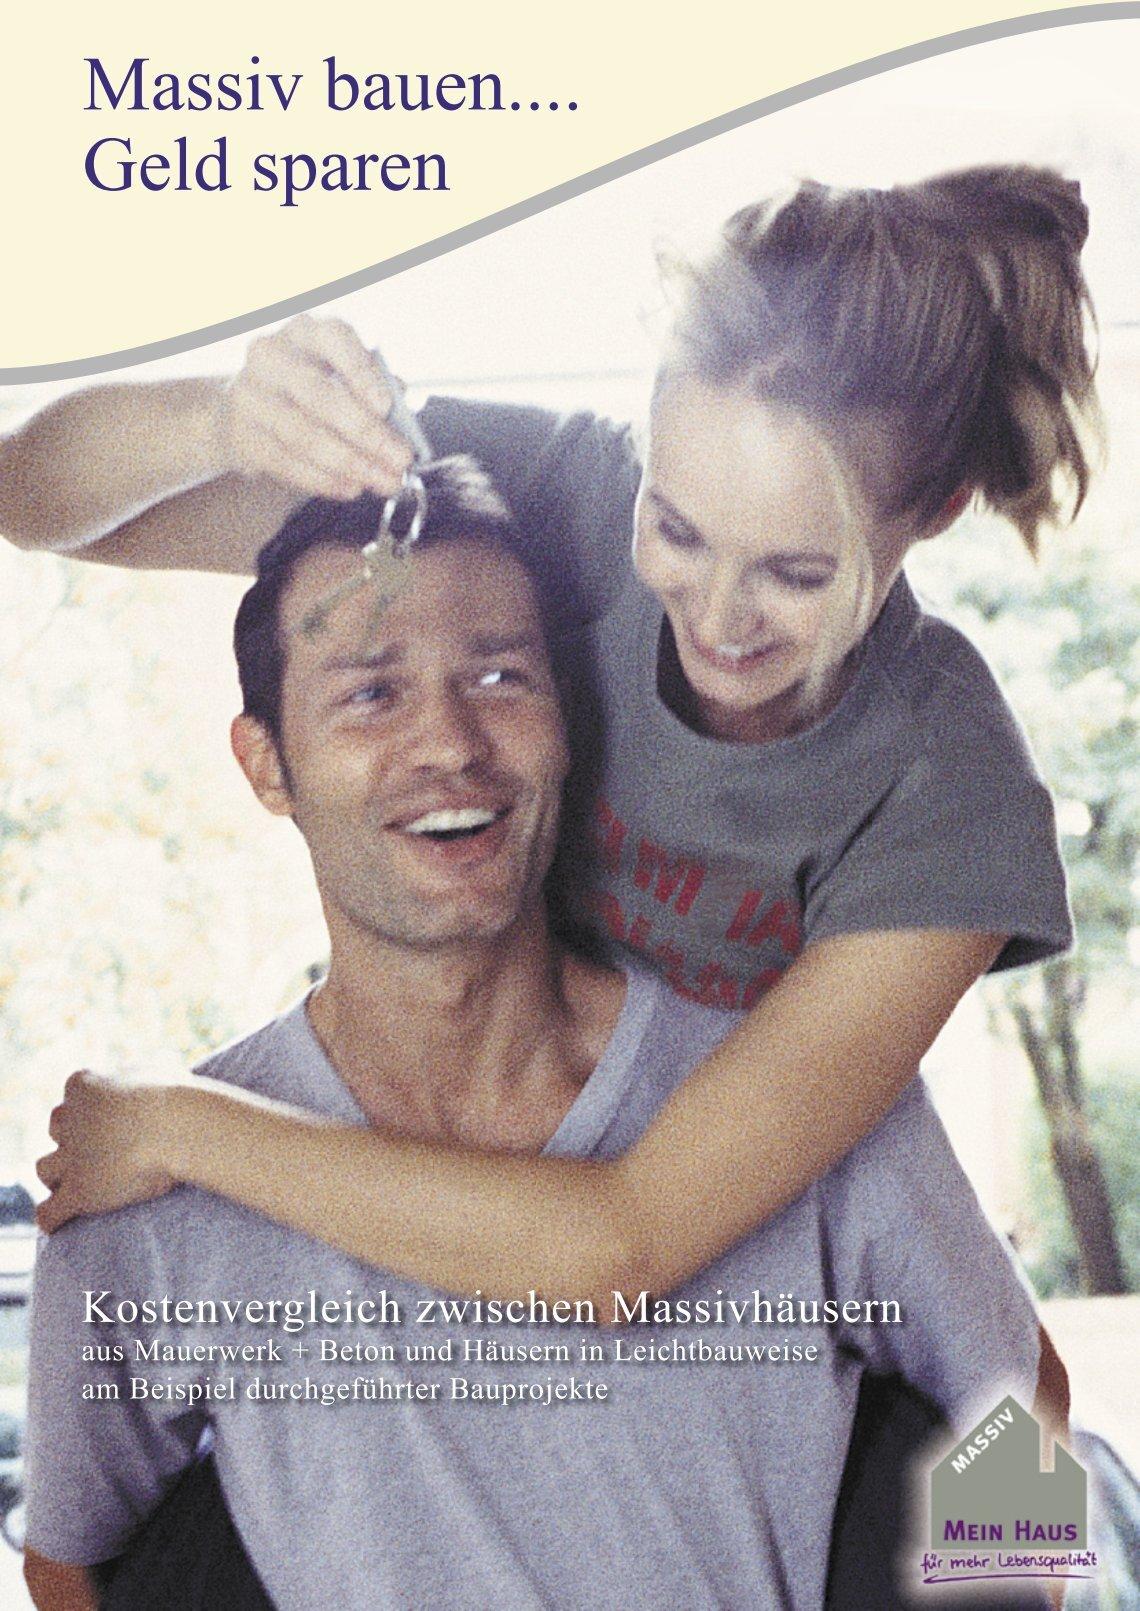 6 free Magazines from MASSIV.MEIN.HAUS.DE